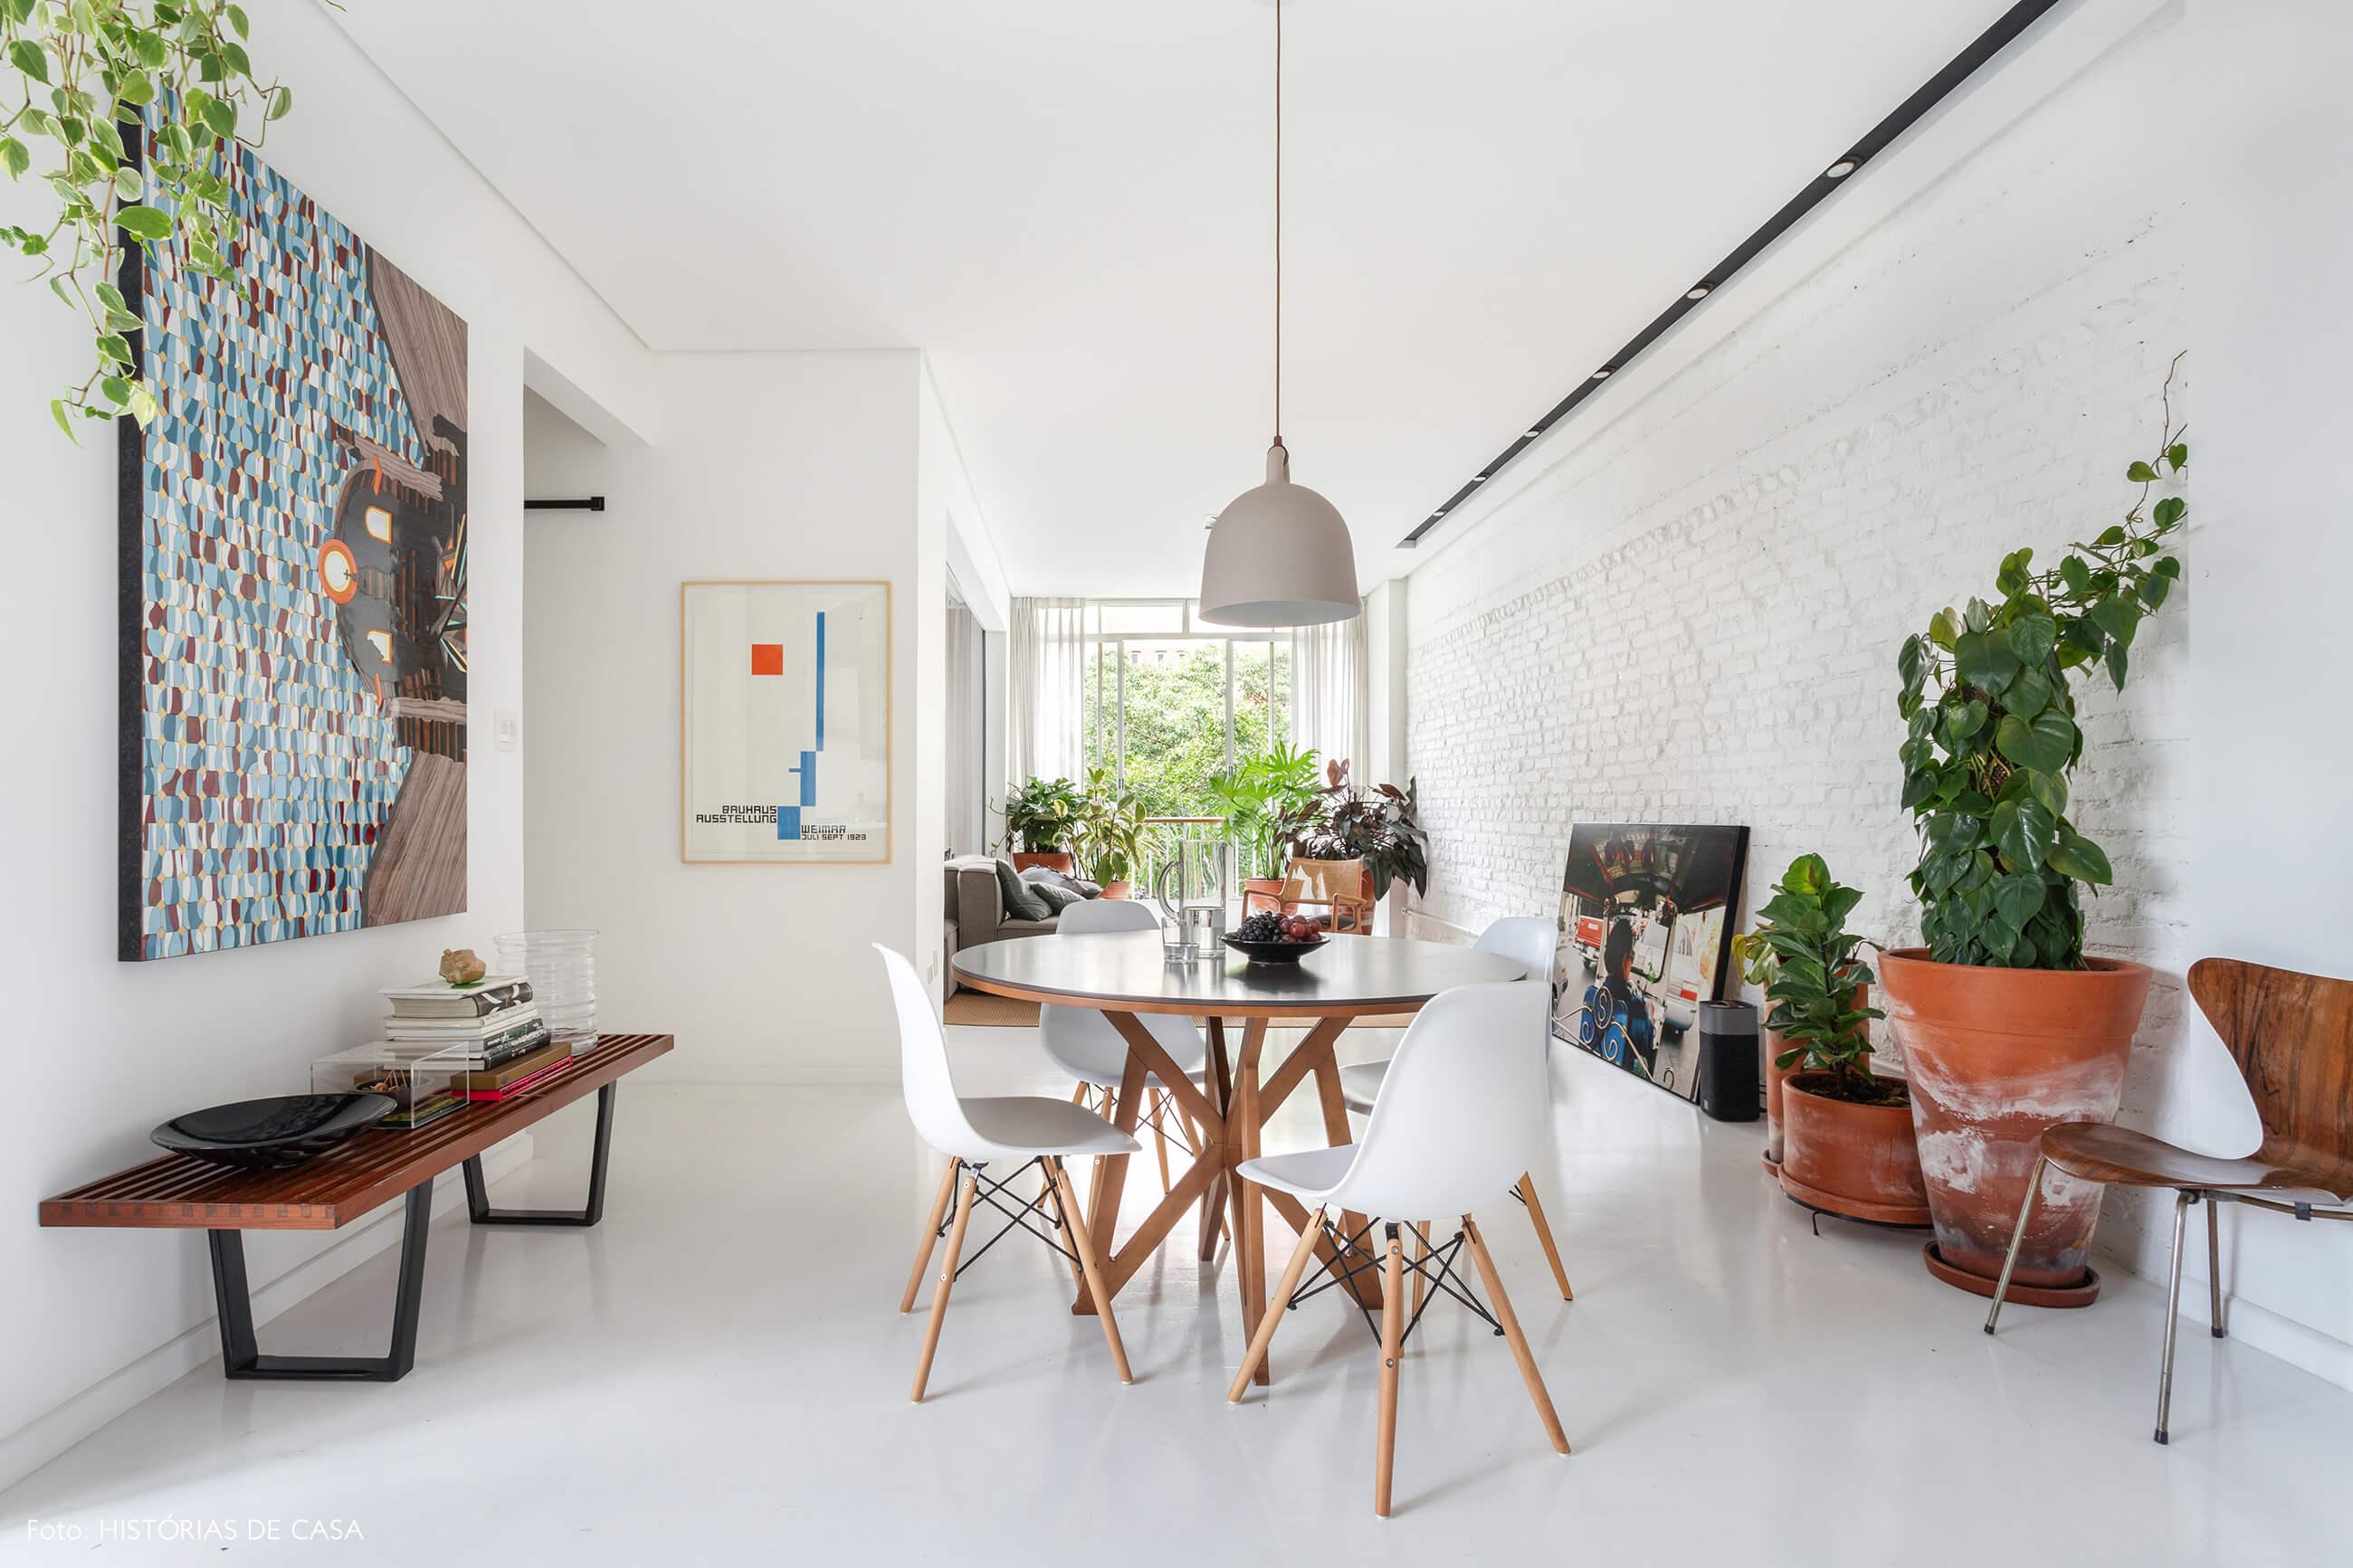 Apartamento escandinavo, sala de jantar com piso branco e mesa redonda